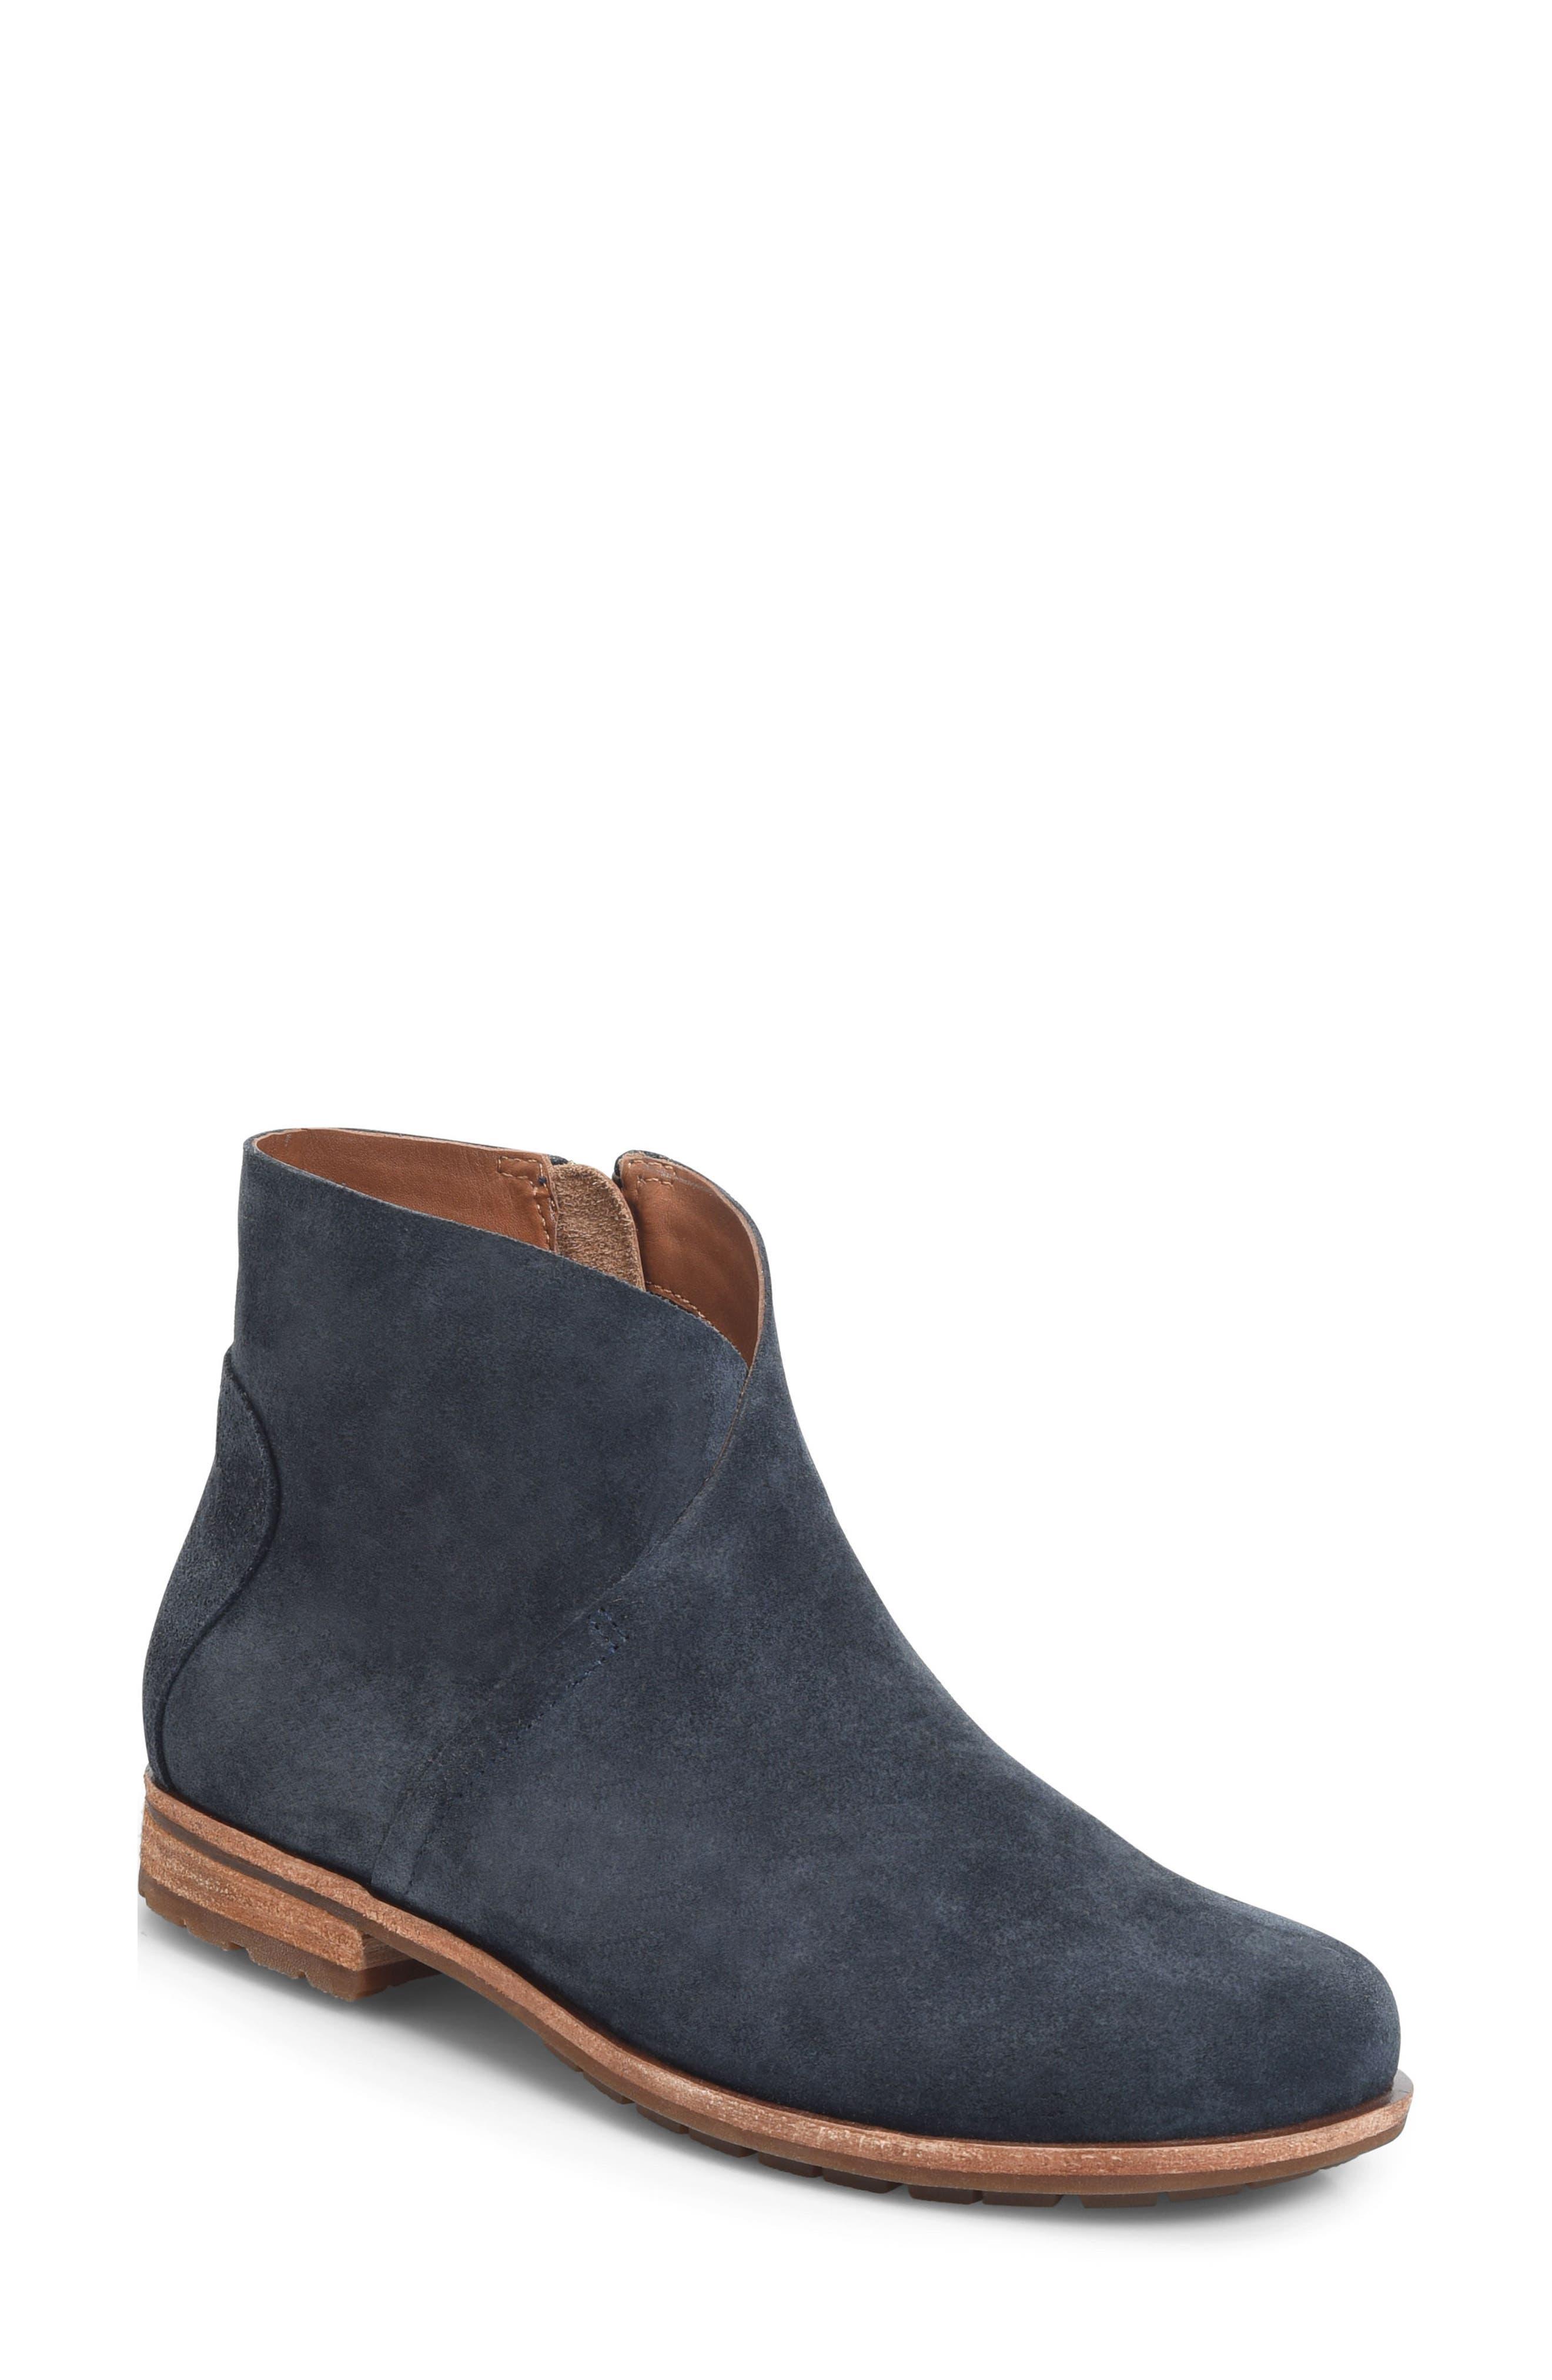 Main Image - Kork-Ease® Balsa Boot (Women)